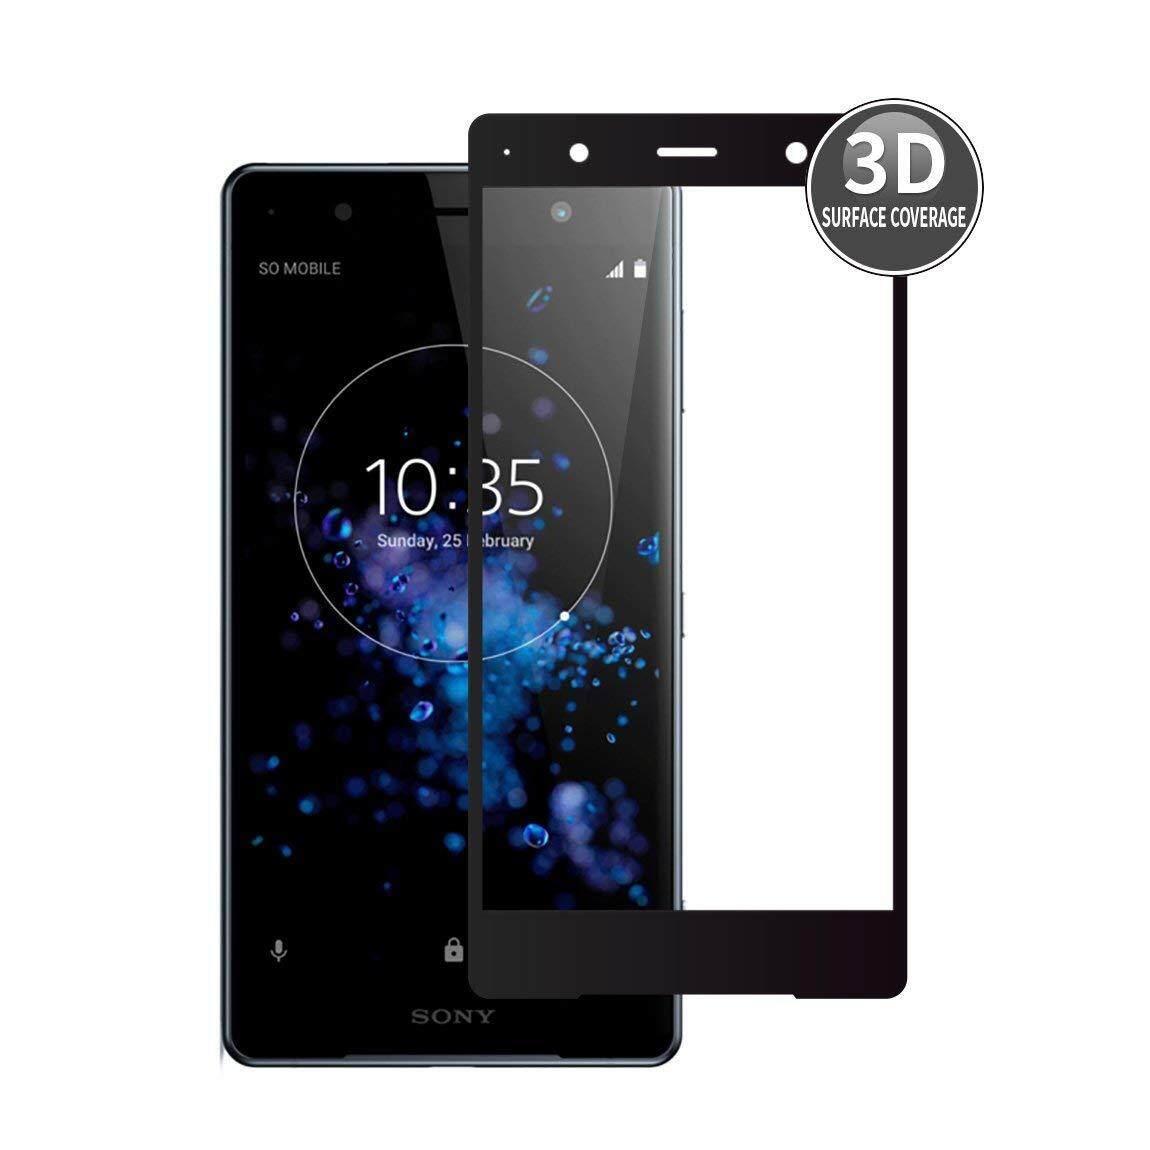 Features For Zenfone 3 5 Ze552kl Black 3d Curved Protective Film Asus Sony Xperia Xz2 Primiun Complete Cover Premium